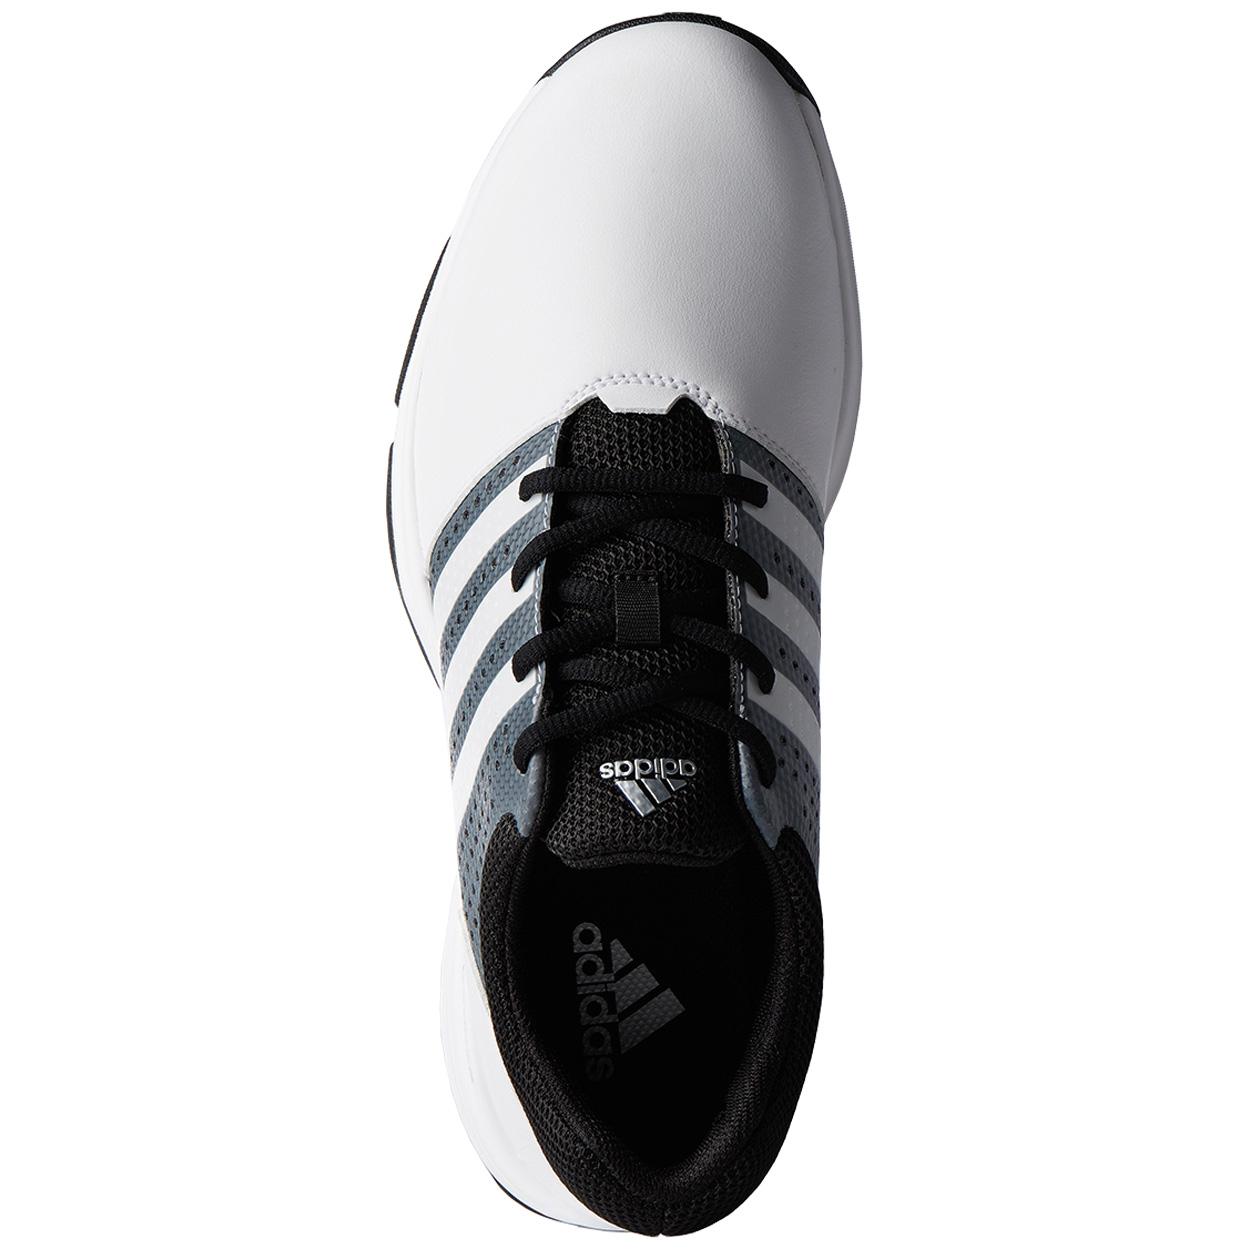 Adidas-Men-039-s-360-Traxion-Golf-Shoes thumbnail 14